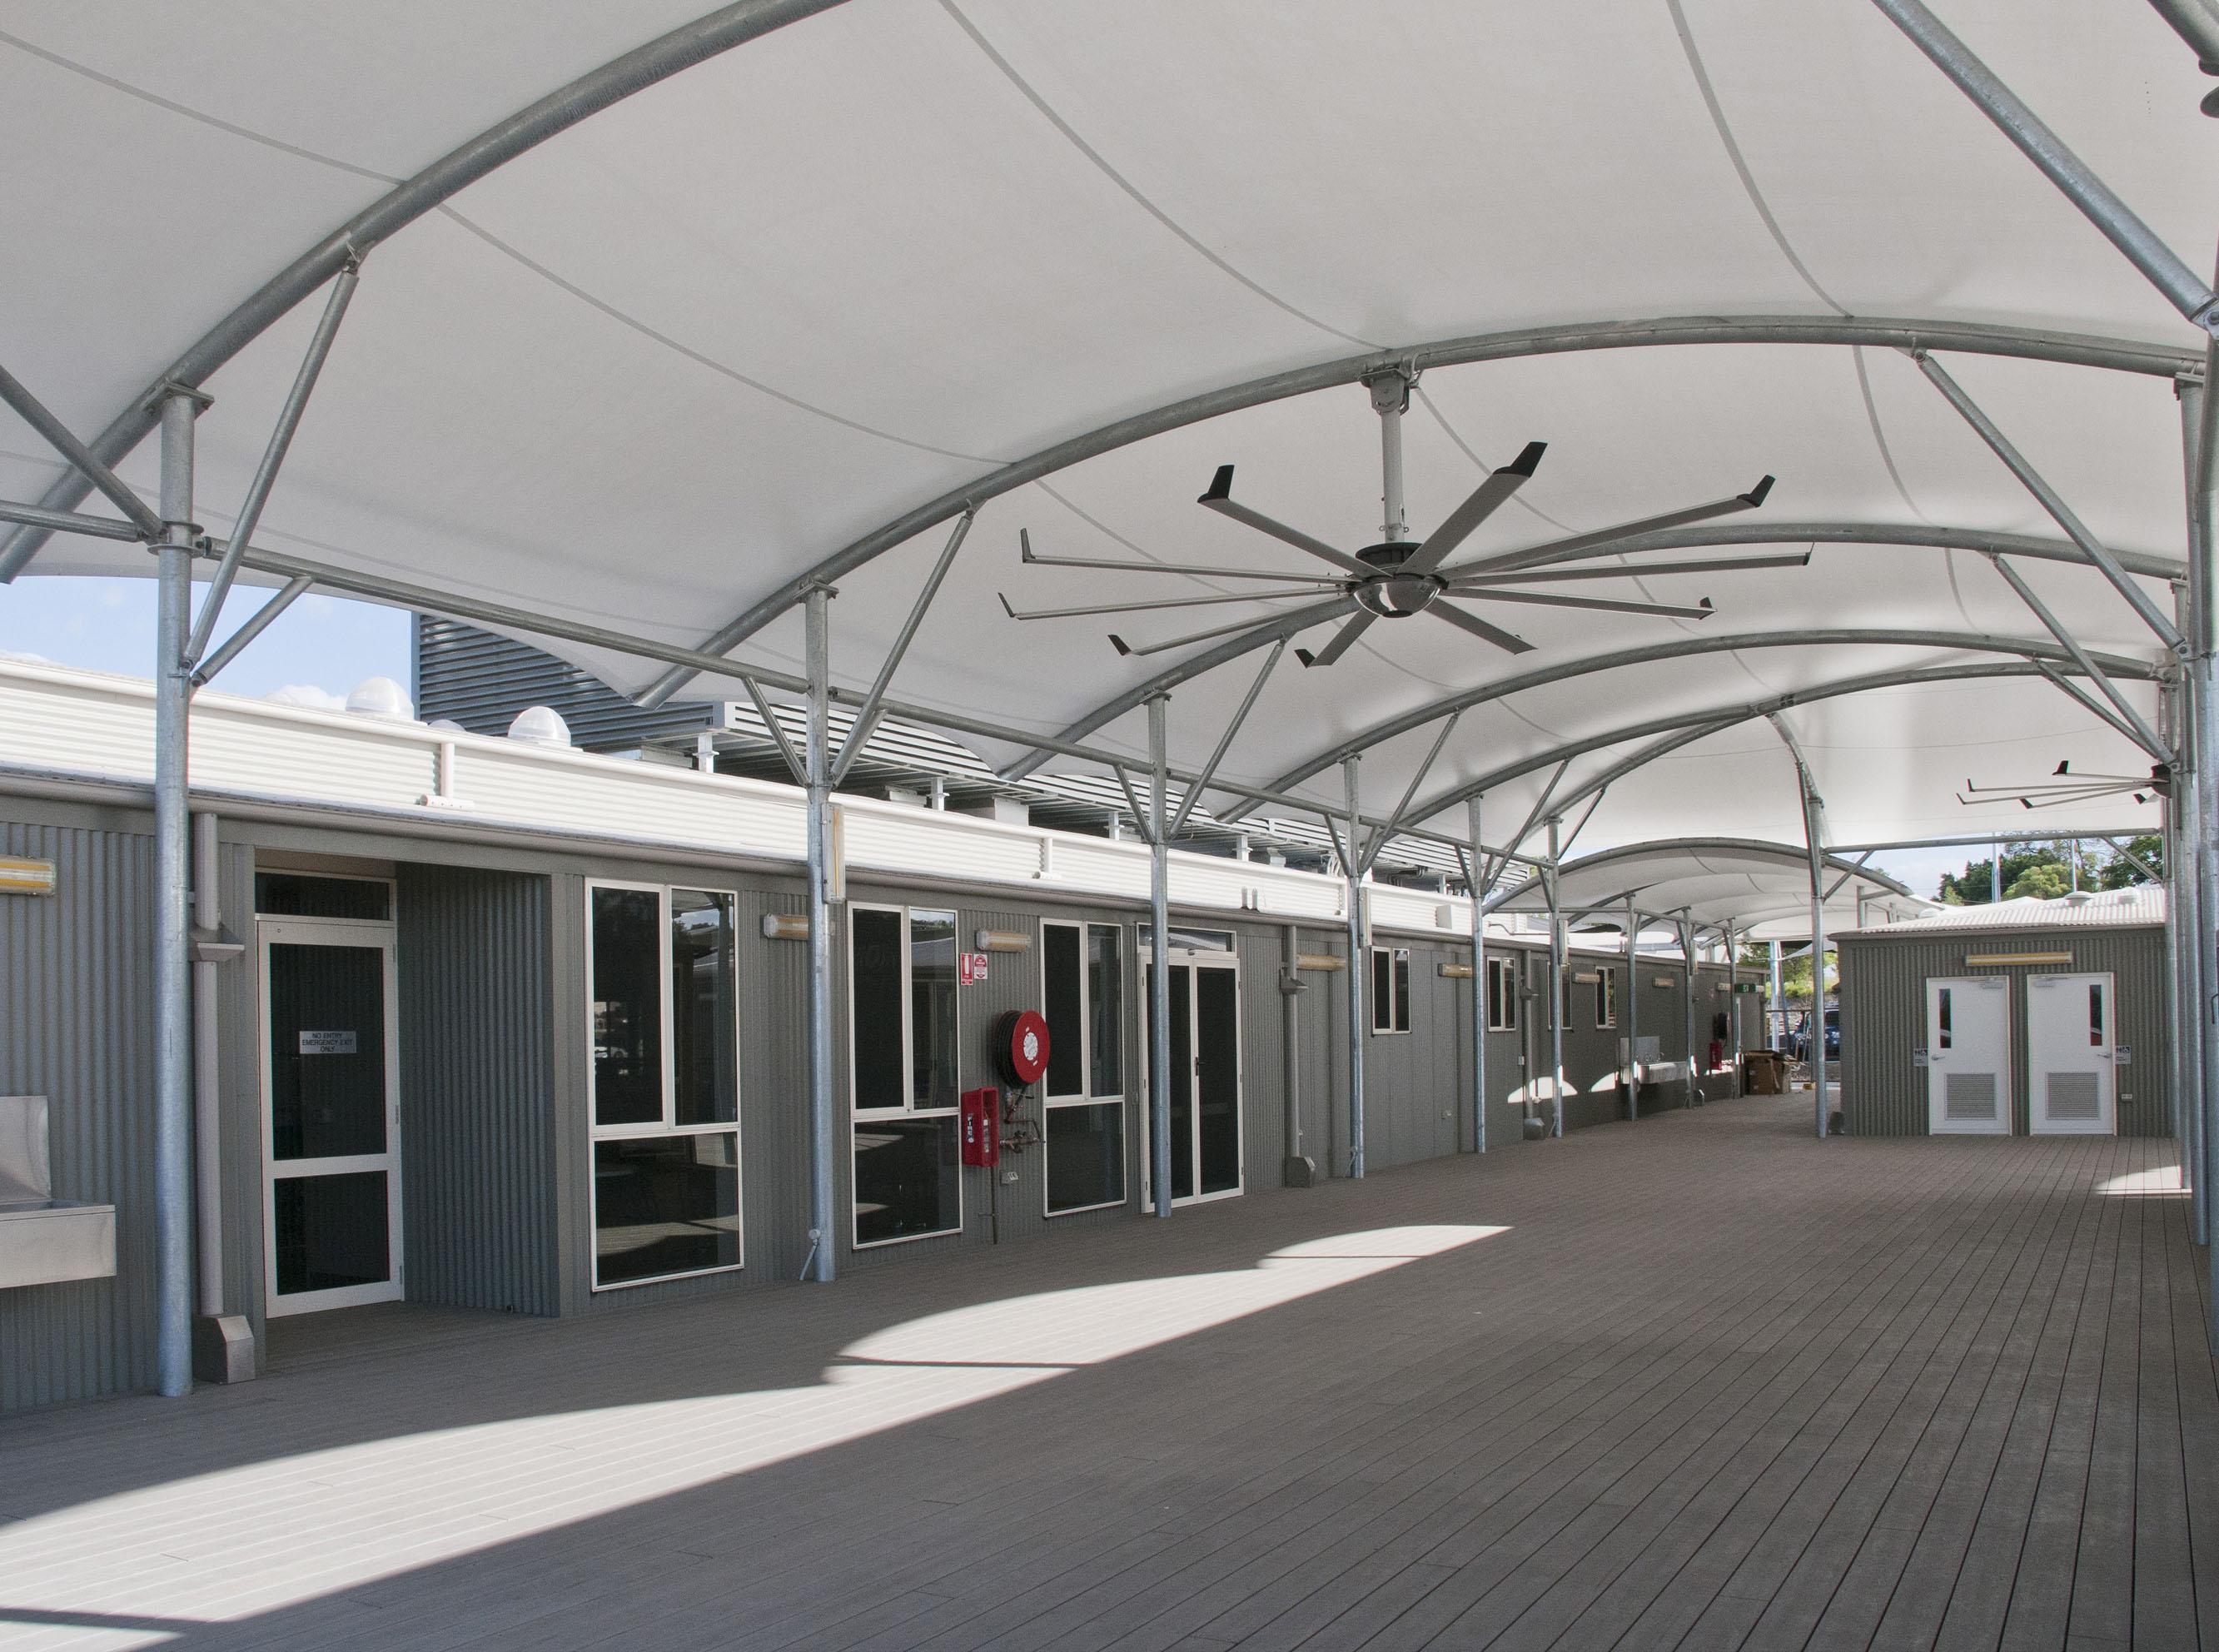 11277-moranbah-central-car-park-pvc-mesh-2012-fs-3